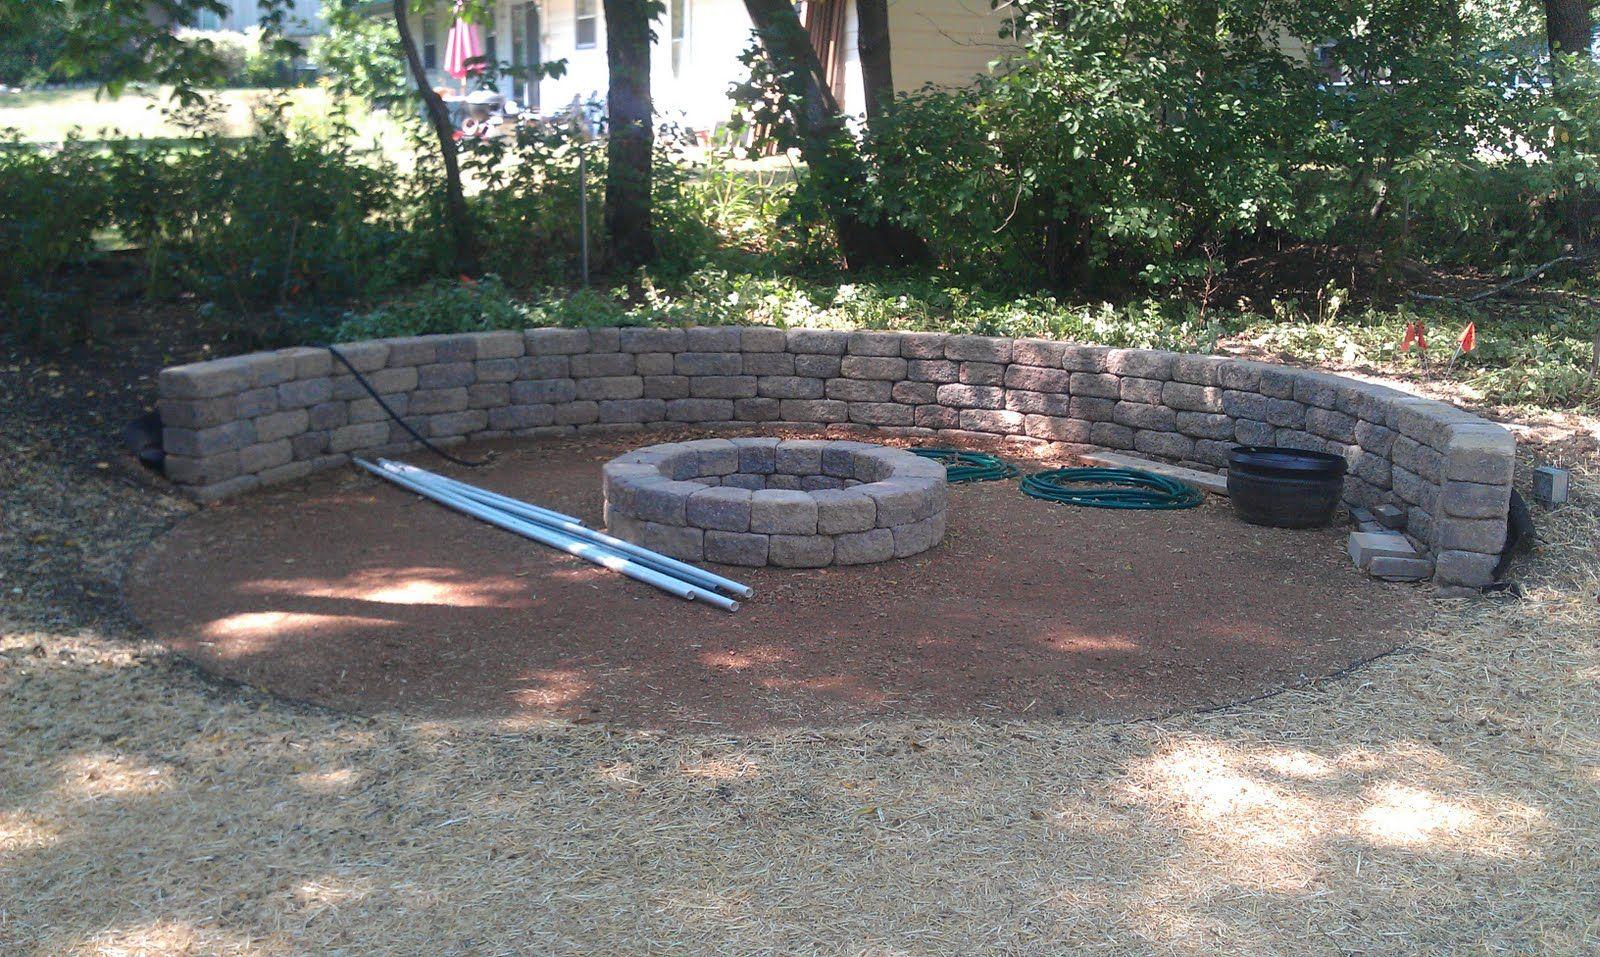 Grading, Landscaping, Paver Patios, Retaining Walls and Yard